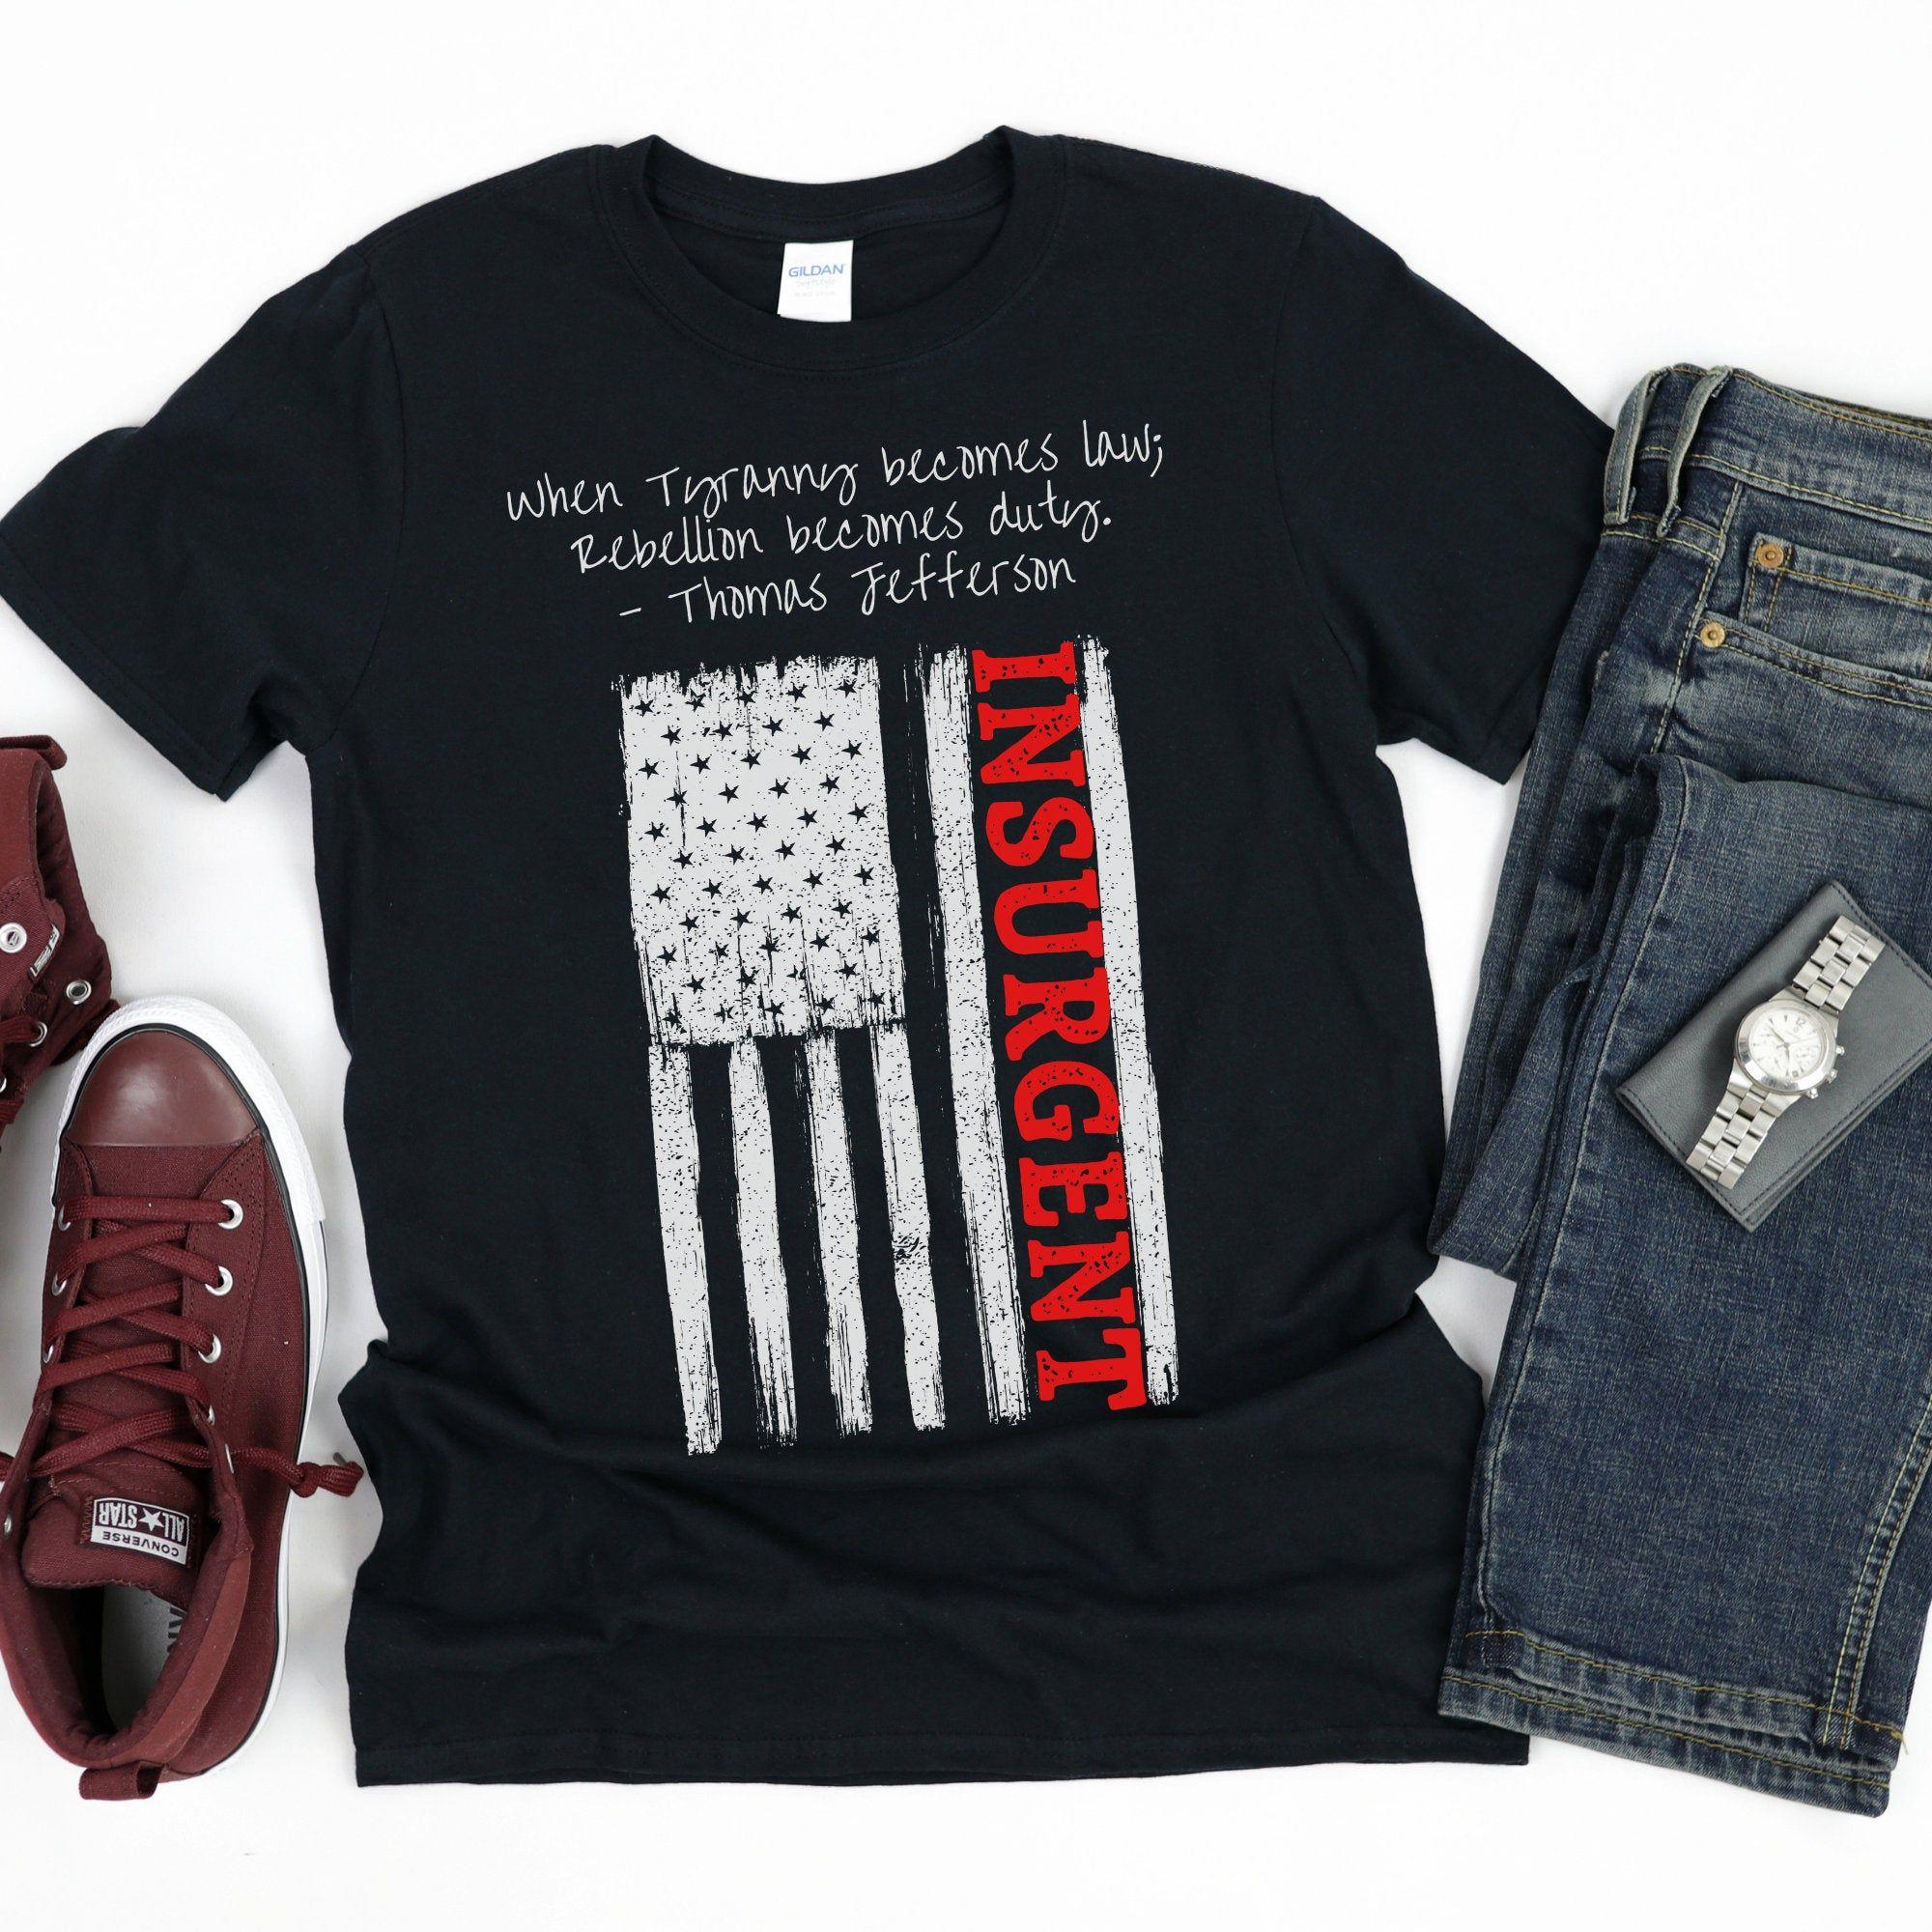 Insurgent Shirt Free Speech Shirt Anti Censorship Anti Etsy In 2021 Speech Shirts Free Shirts Republican Tees